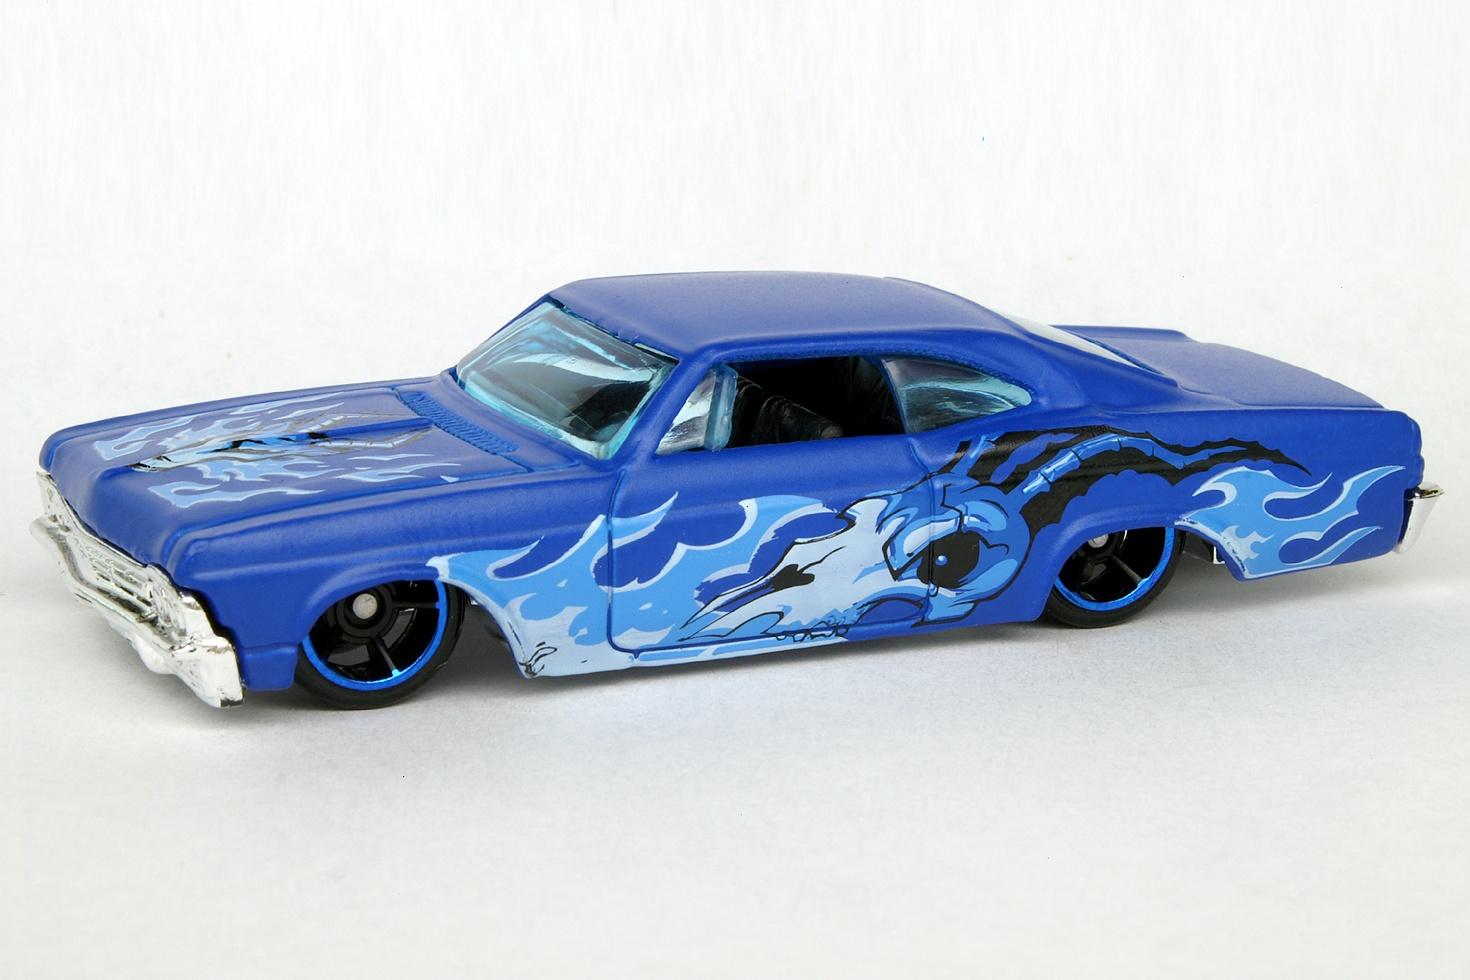 65 Chevy Impala Hot Wheels Wiki